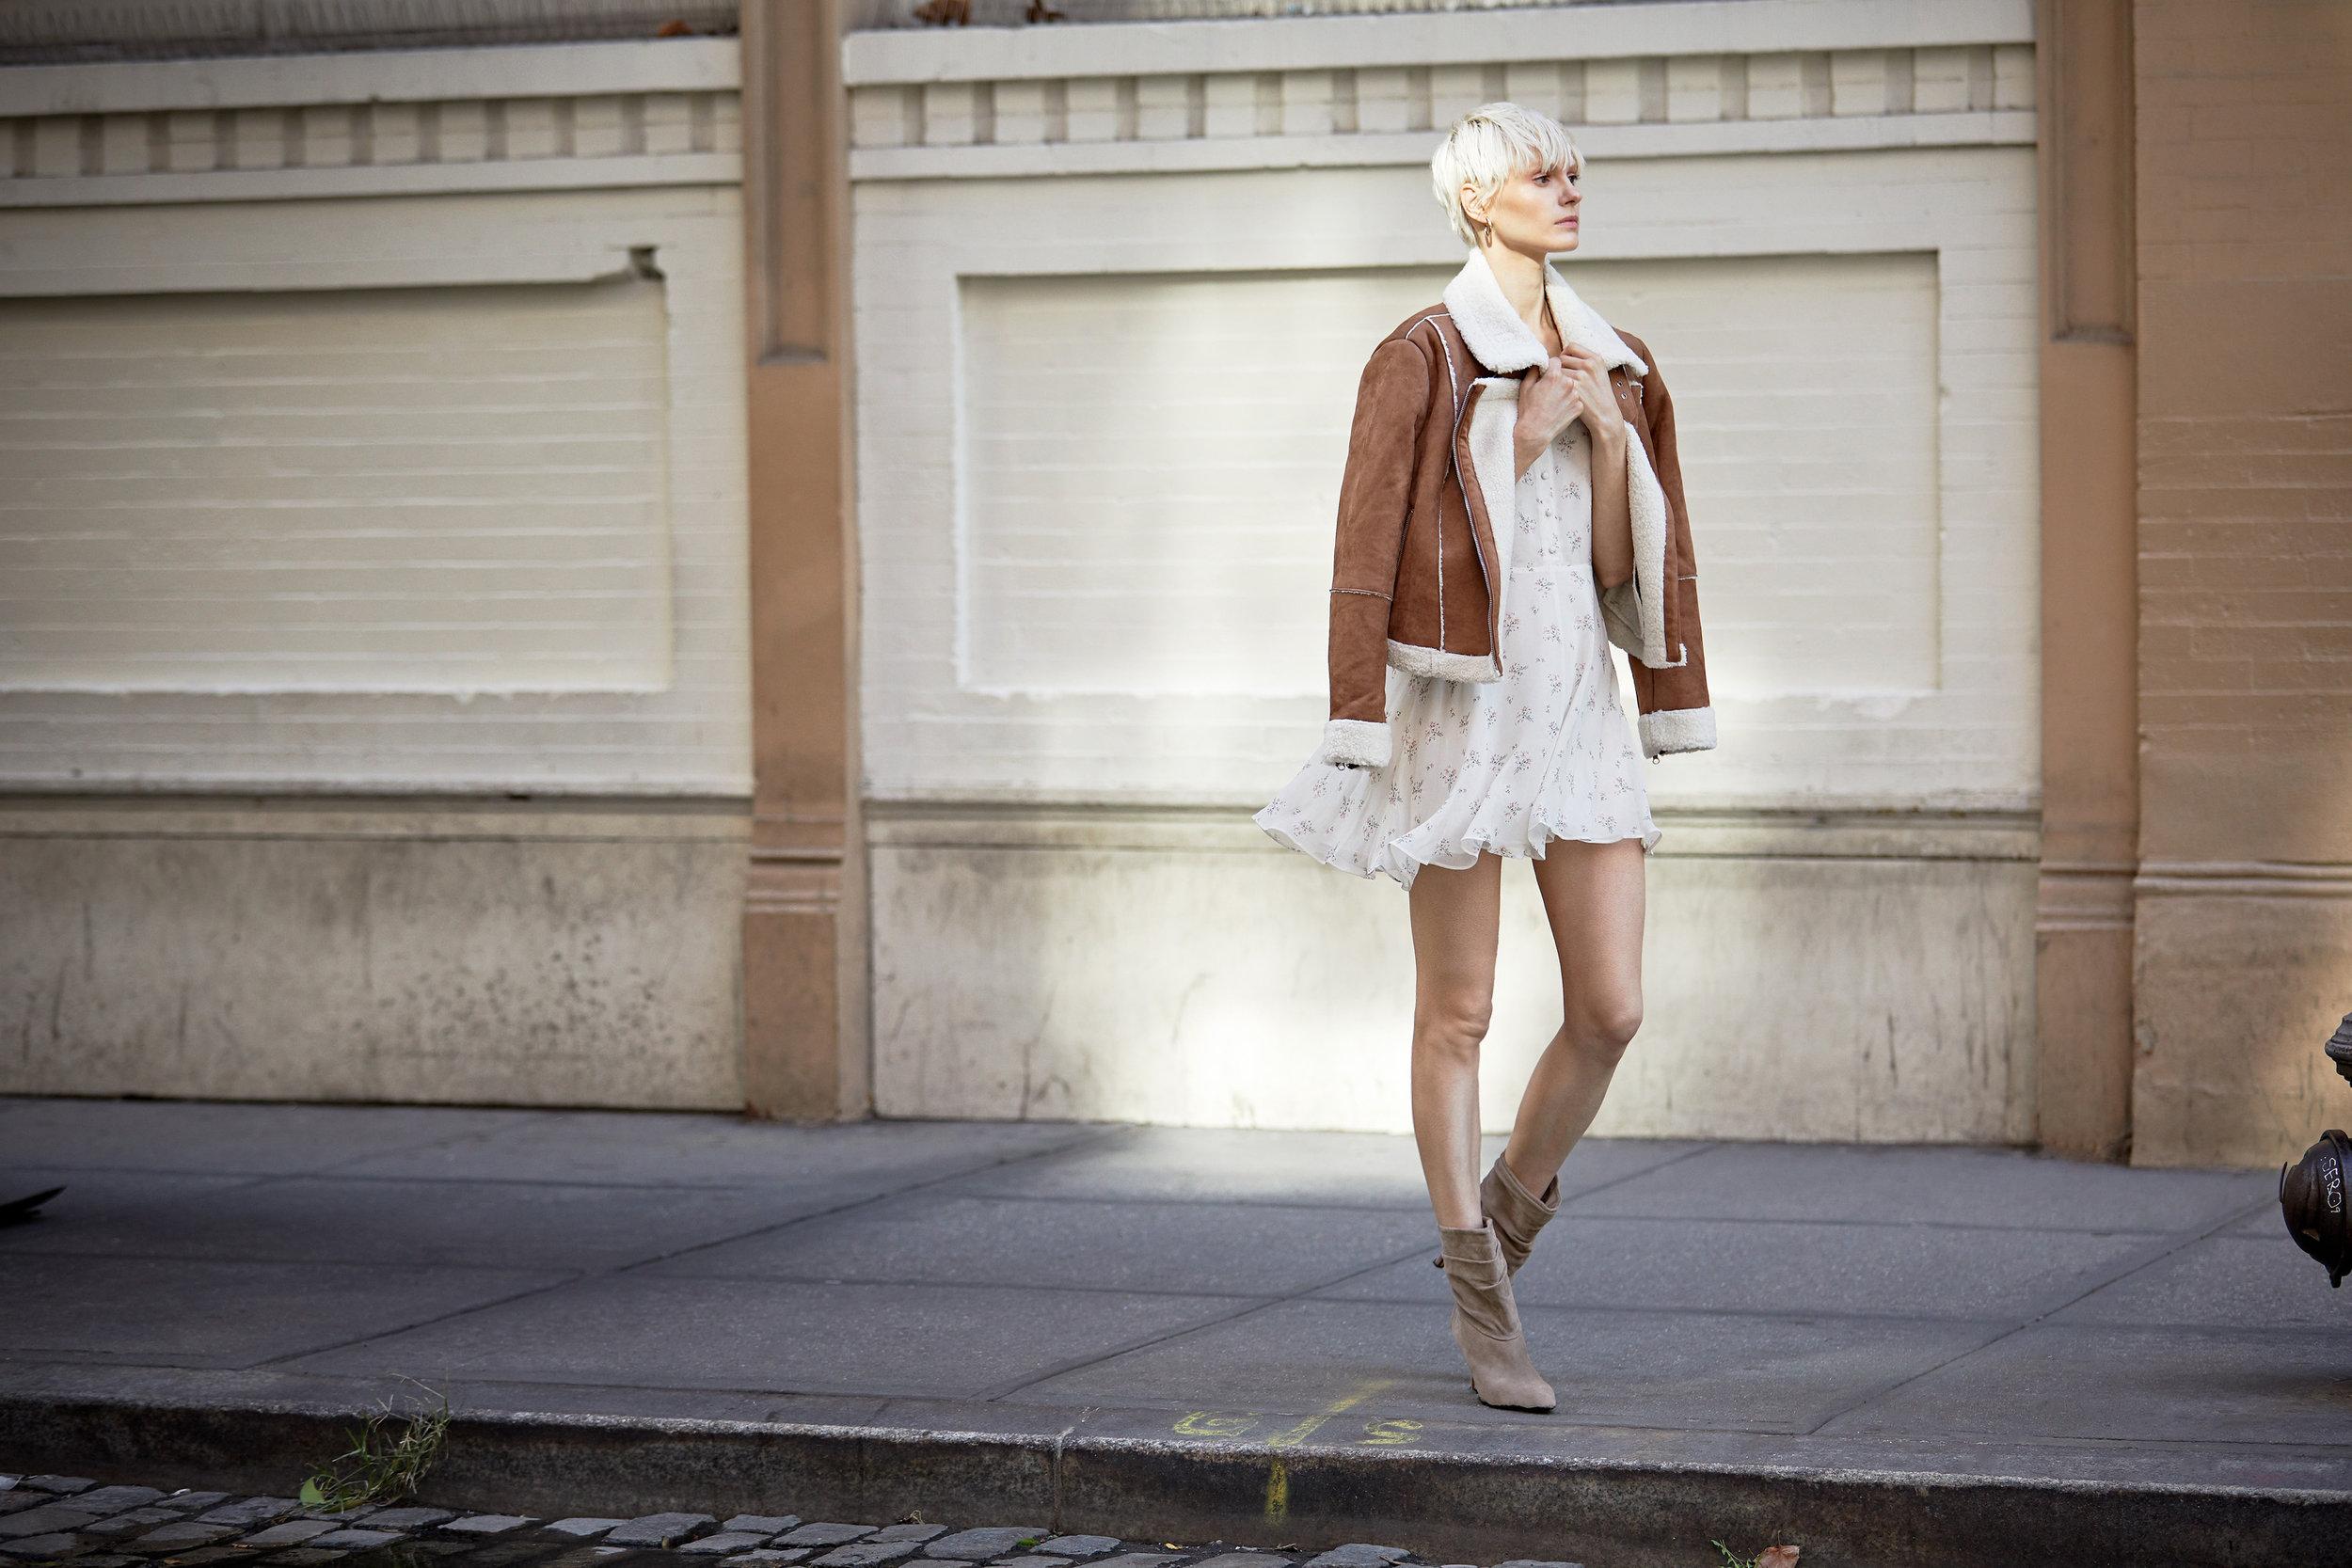 Quincy Suede Shearling Jacket & Cora Silk Floral Mini Dress - Shortbread